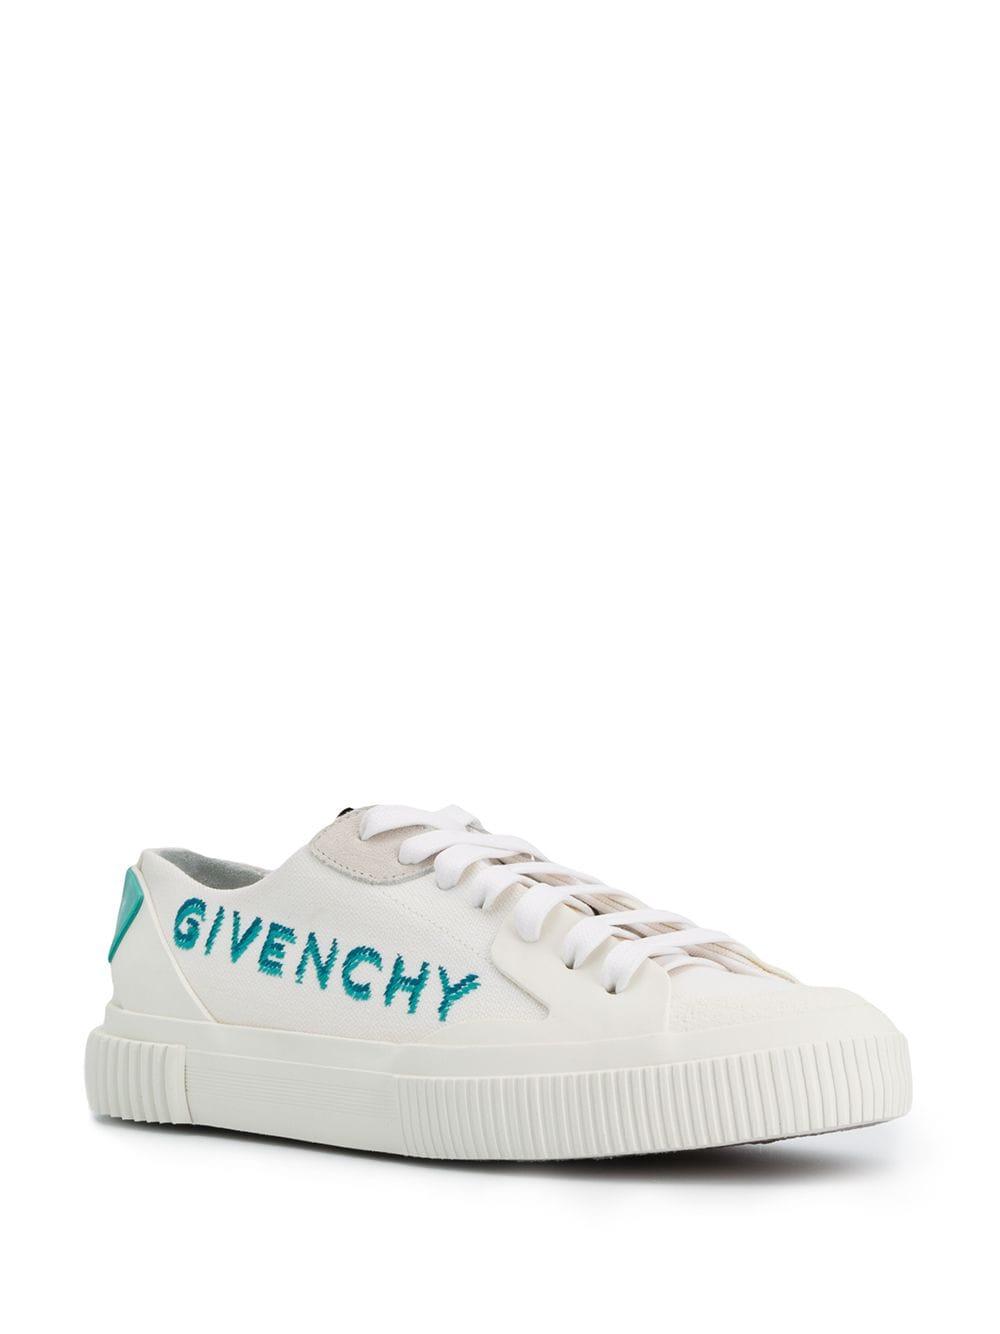 Tennis Light Sneakers